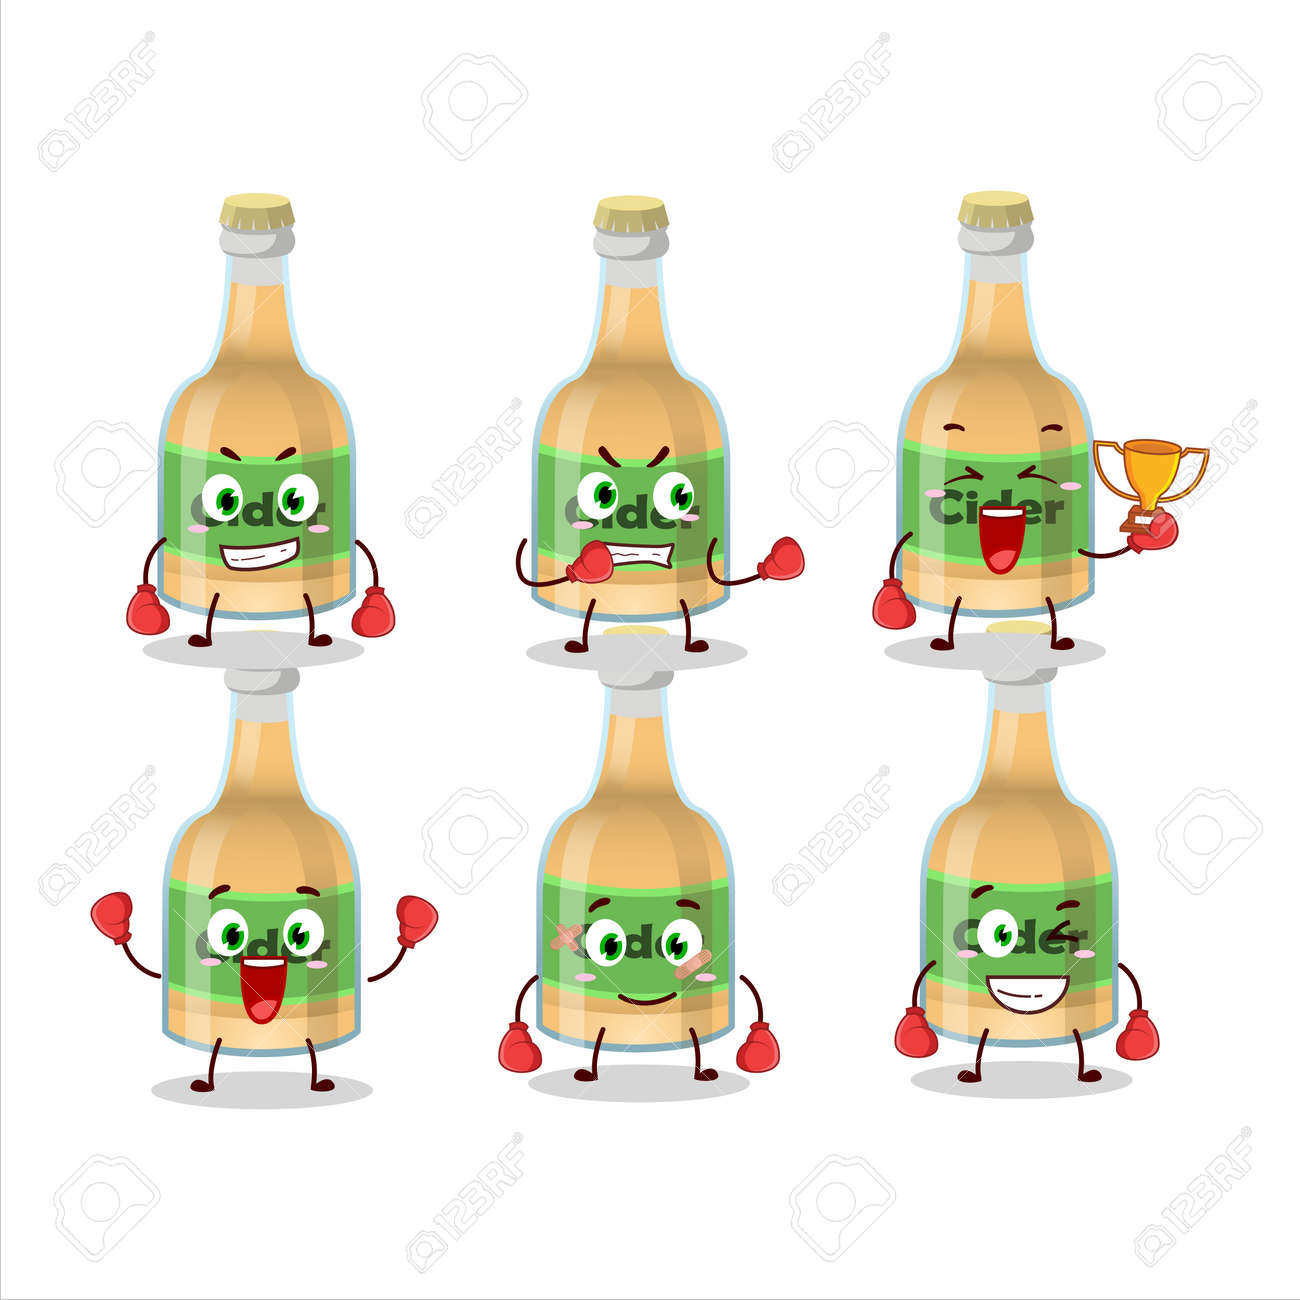 A sporty cider bottle boxing athlete cartoon mascot design - 172516074